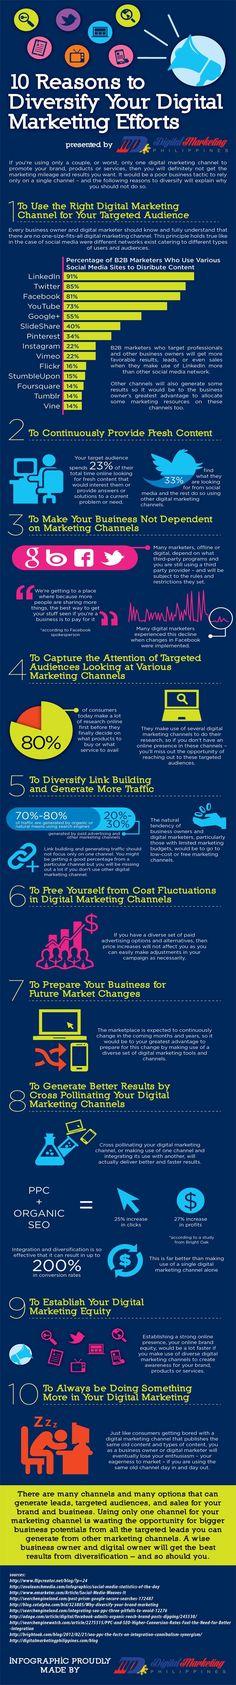 10 Reasons to Diversify Digital #Marketing